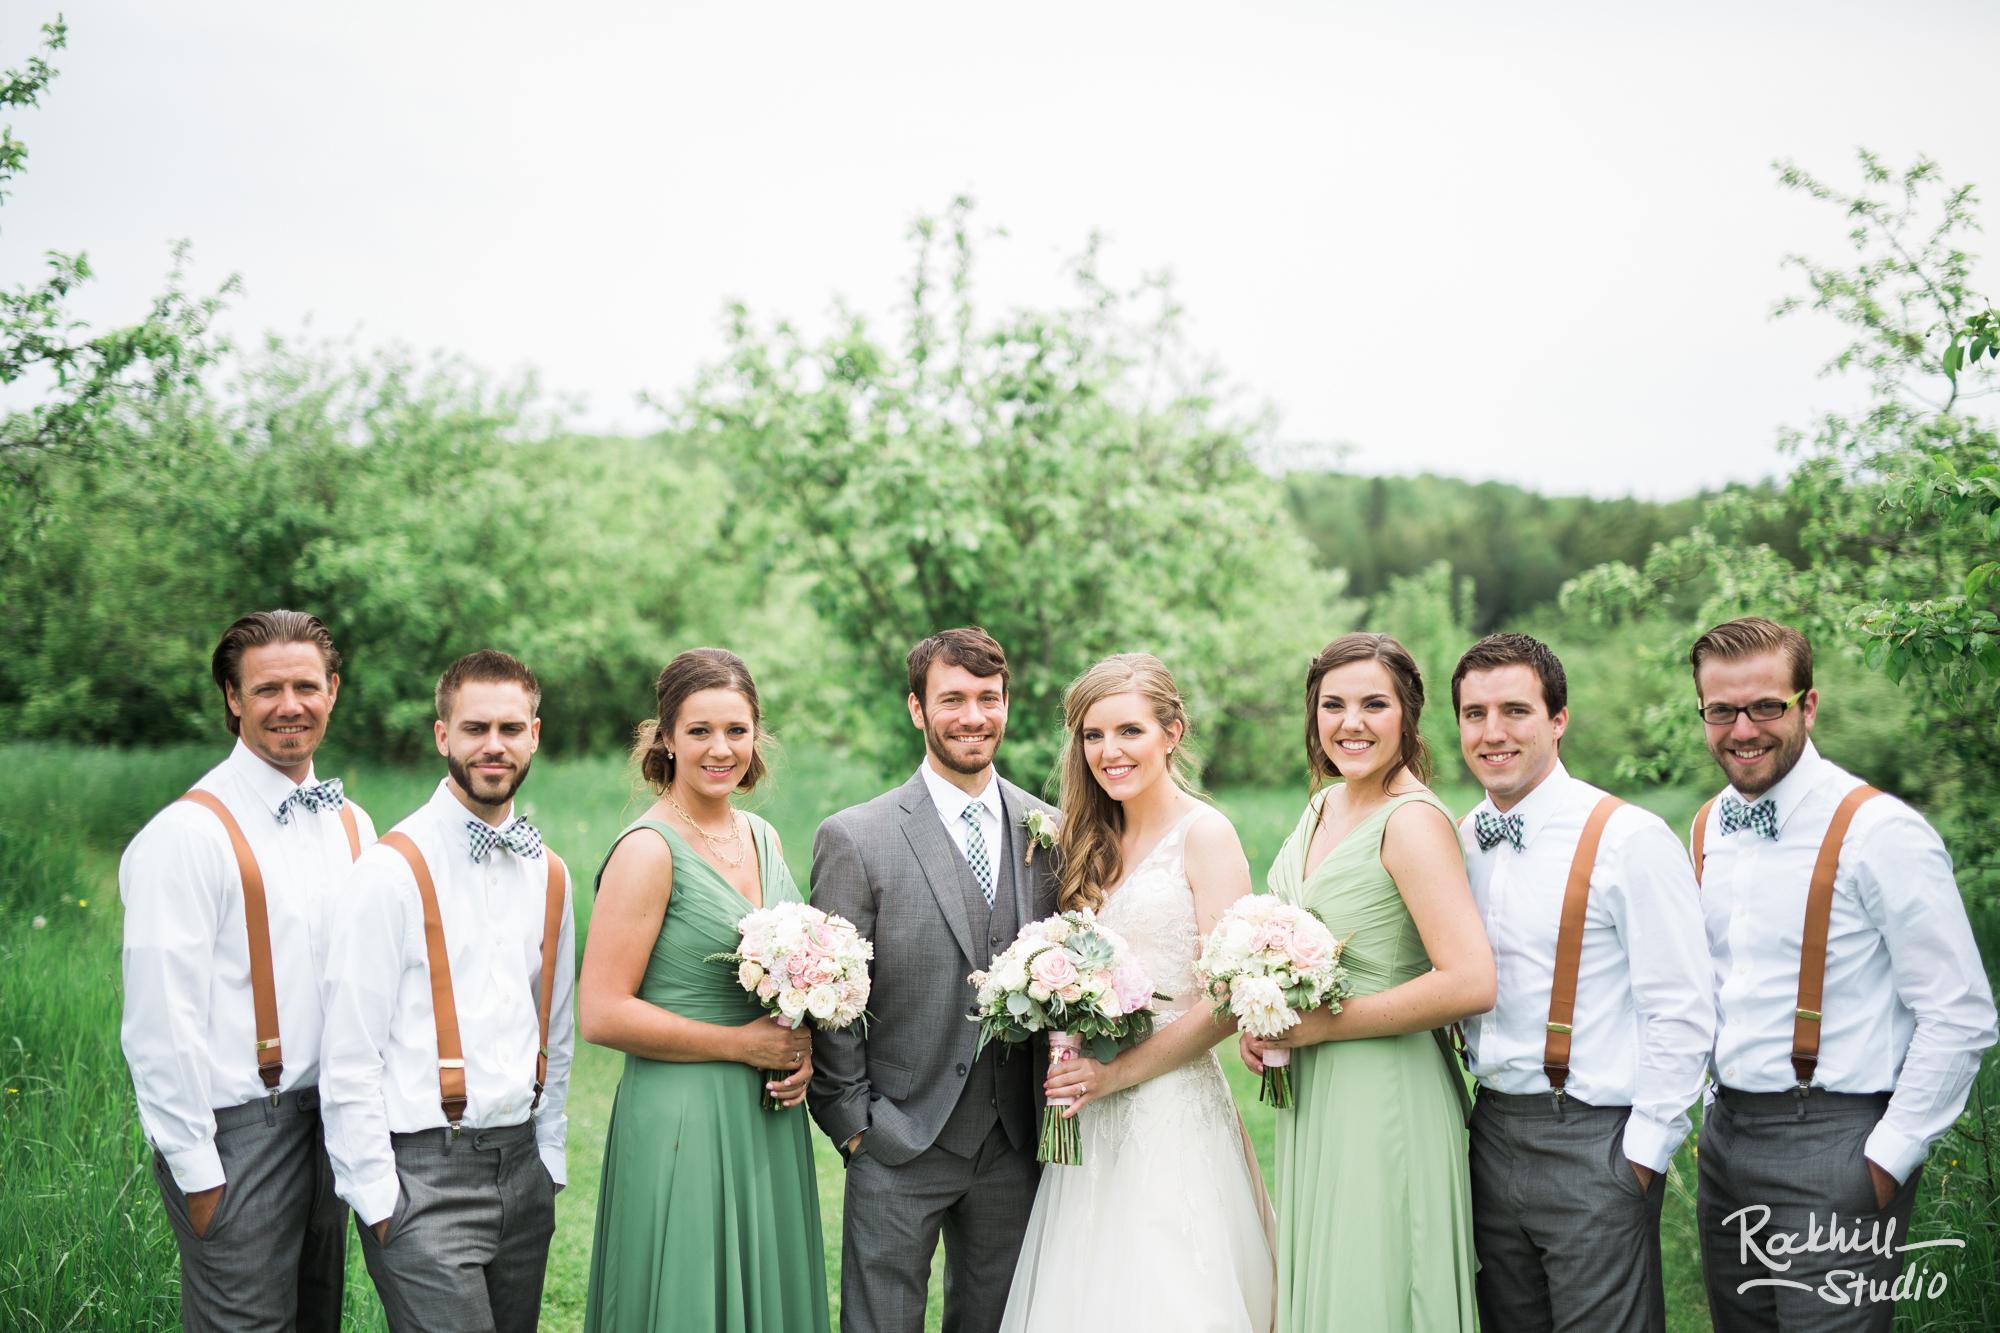 newberry-michigan-wedding-upper-peninsula-spring-photography-rockhill-ee-28.jpg